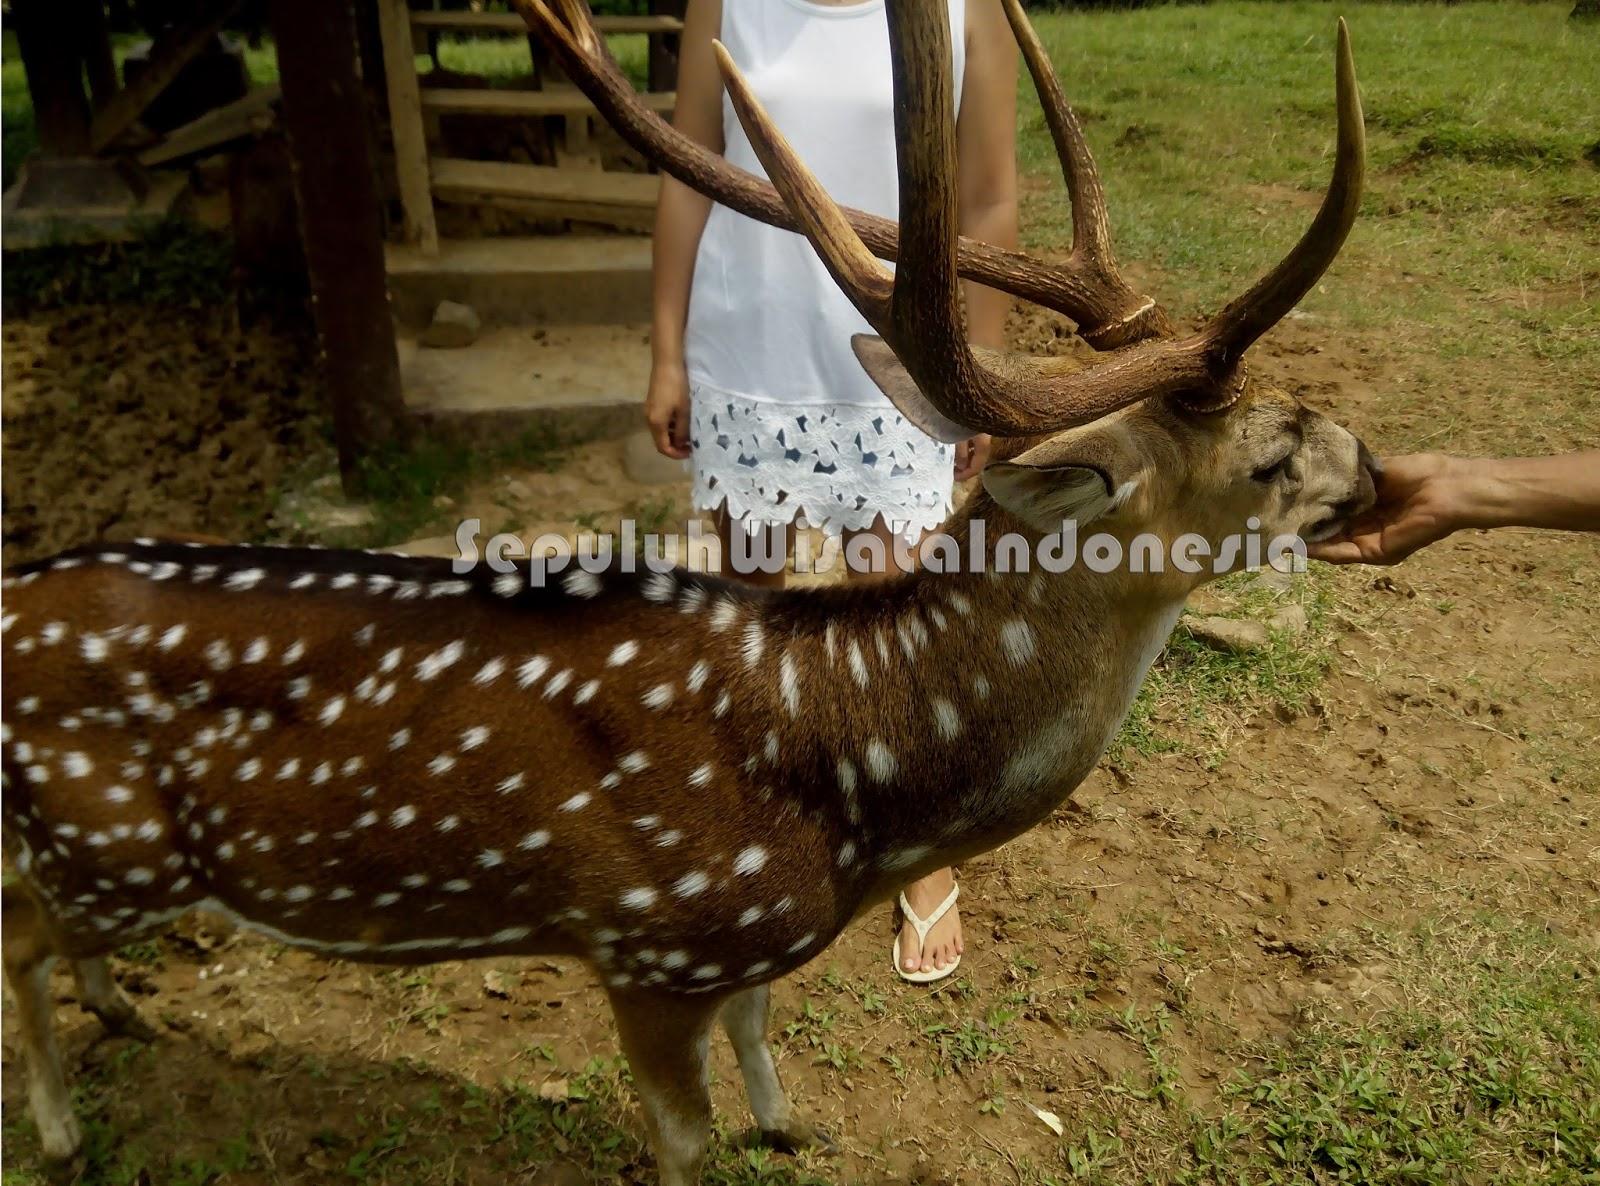 Cariu Pusat Penangkaran Rusa Bogor Wisata Indonesia 3 Giri Jaya